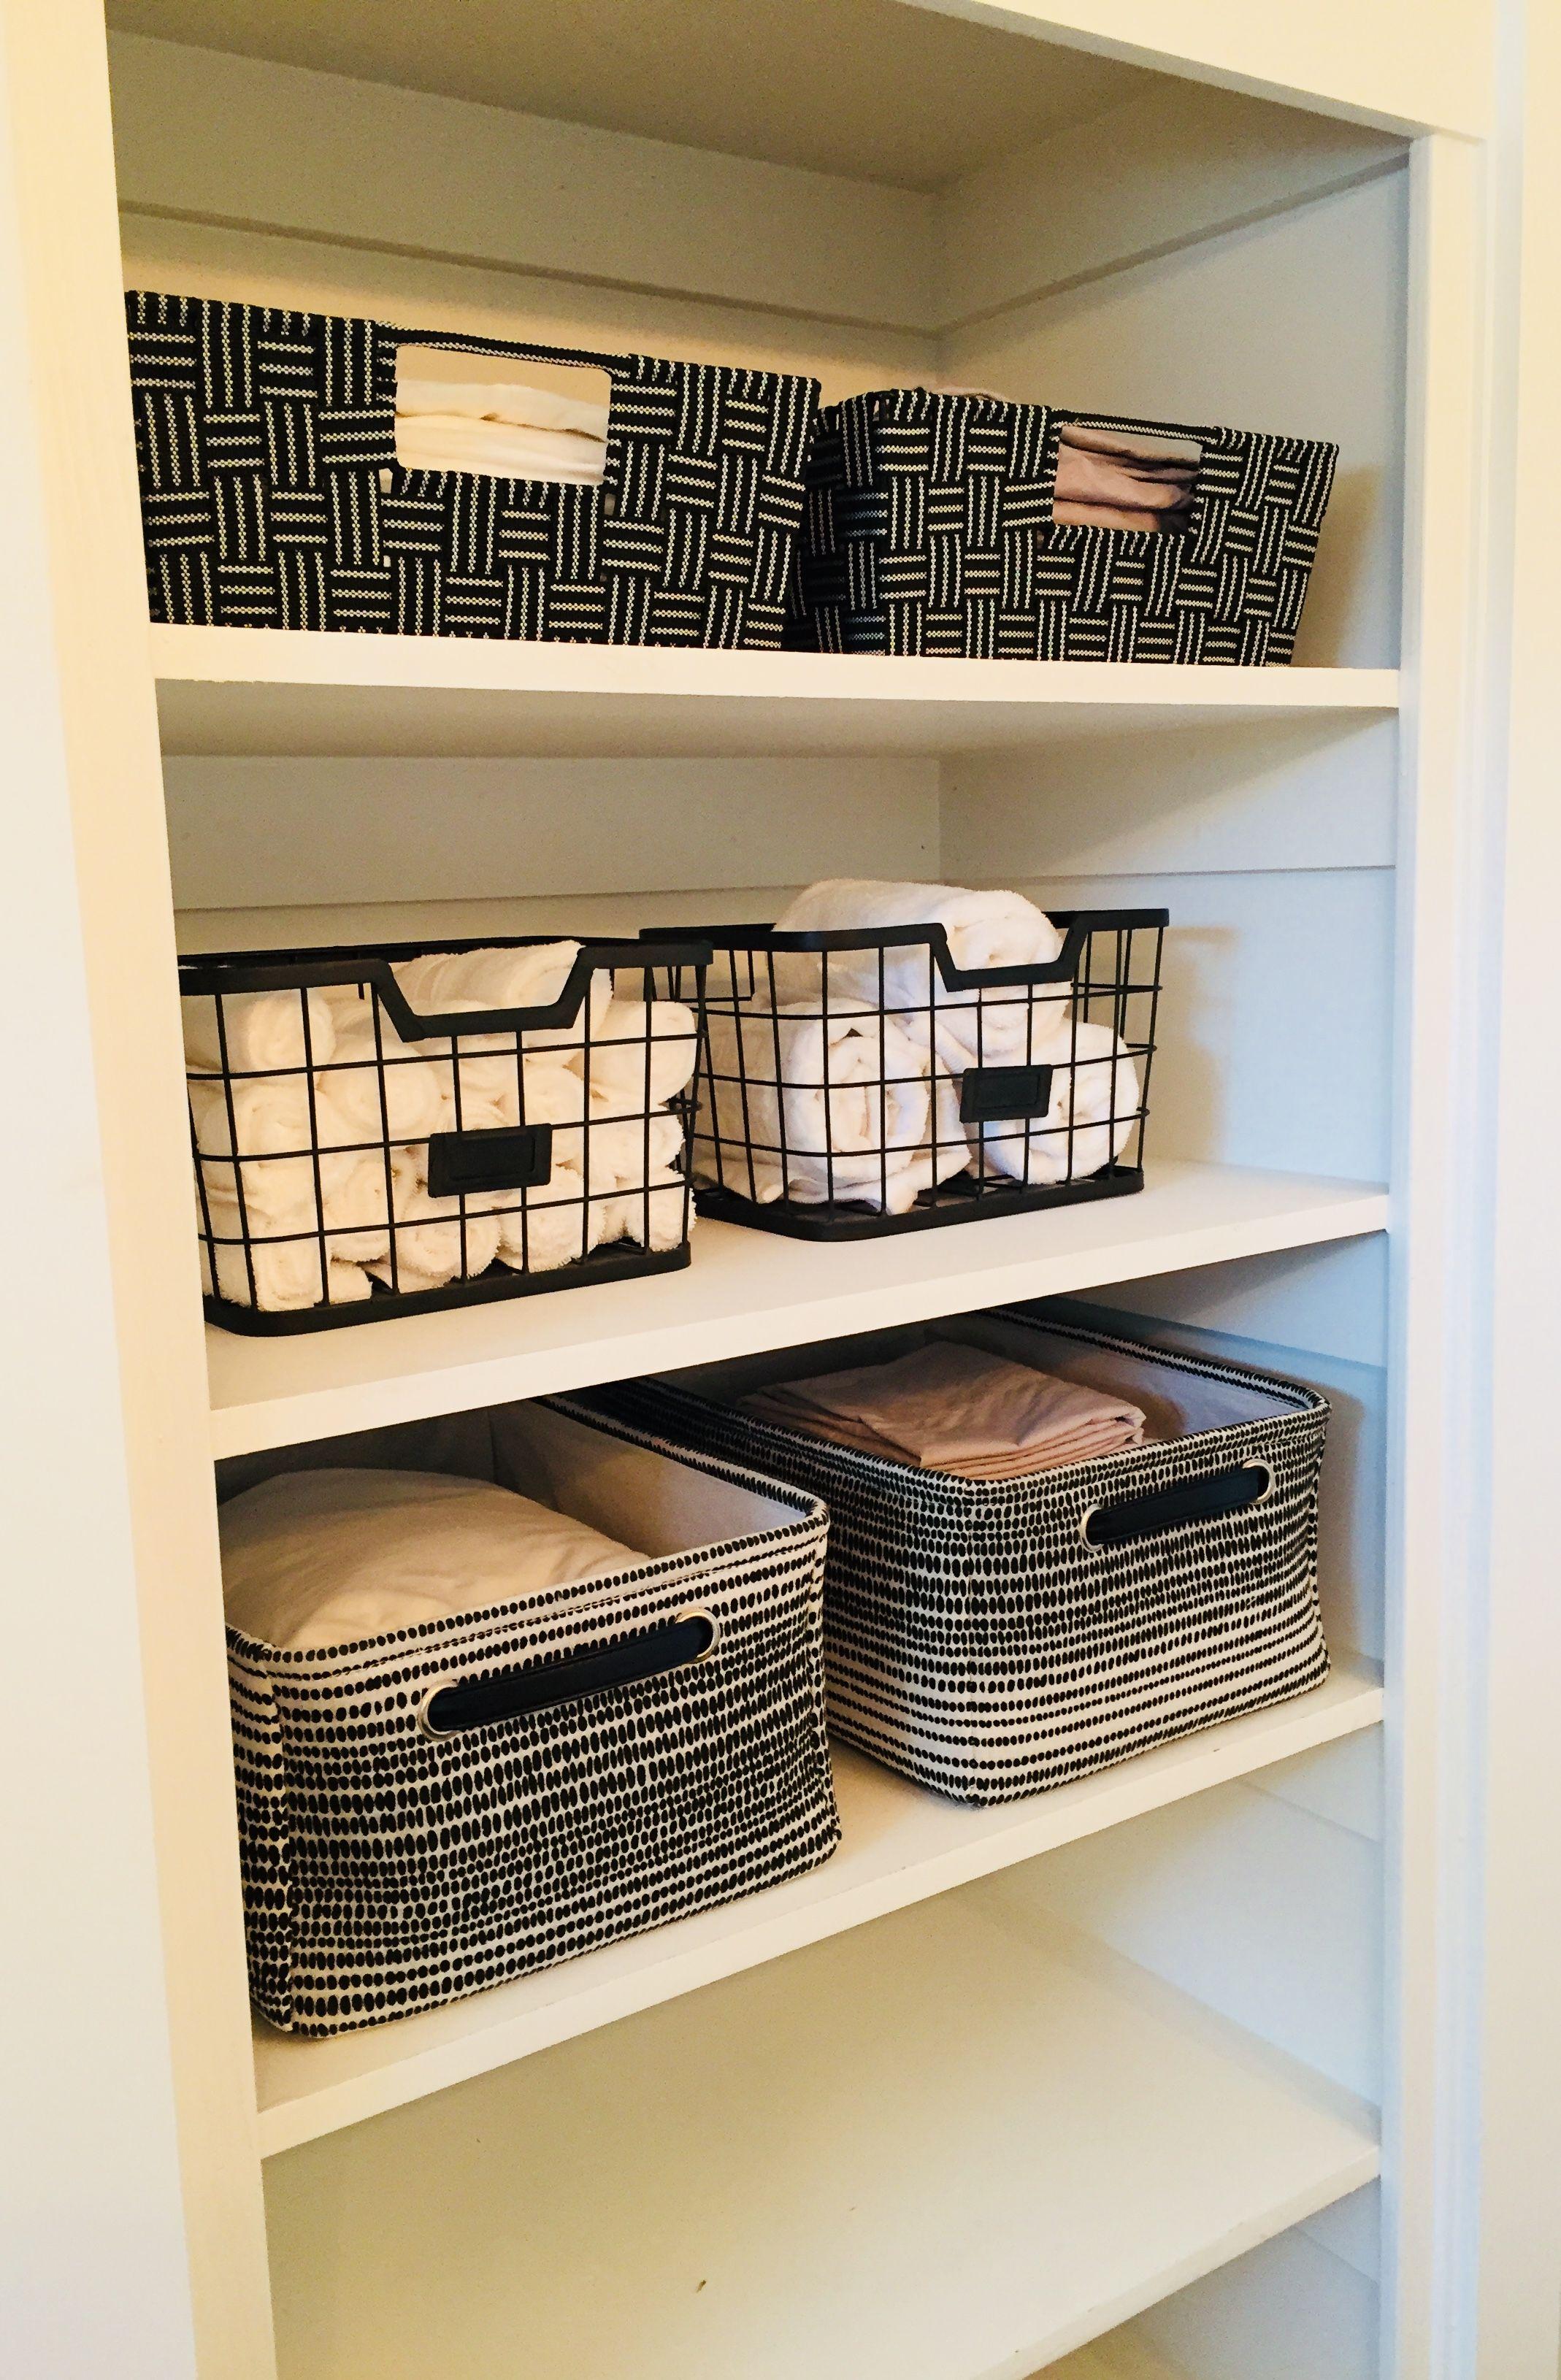 Linen Closet Organization Open Concept Storage Becomes Part Of The Decor Ditch The Door And Take It U Modern Closet Organizers Bathrooms Remodel Linen Closet